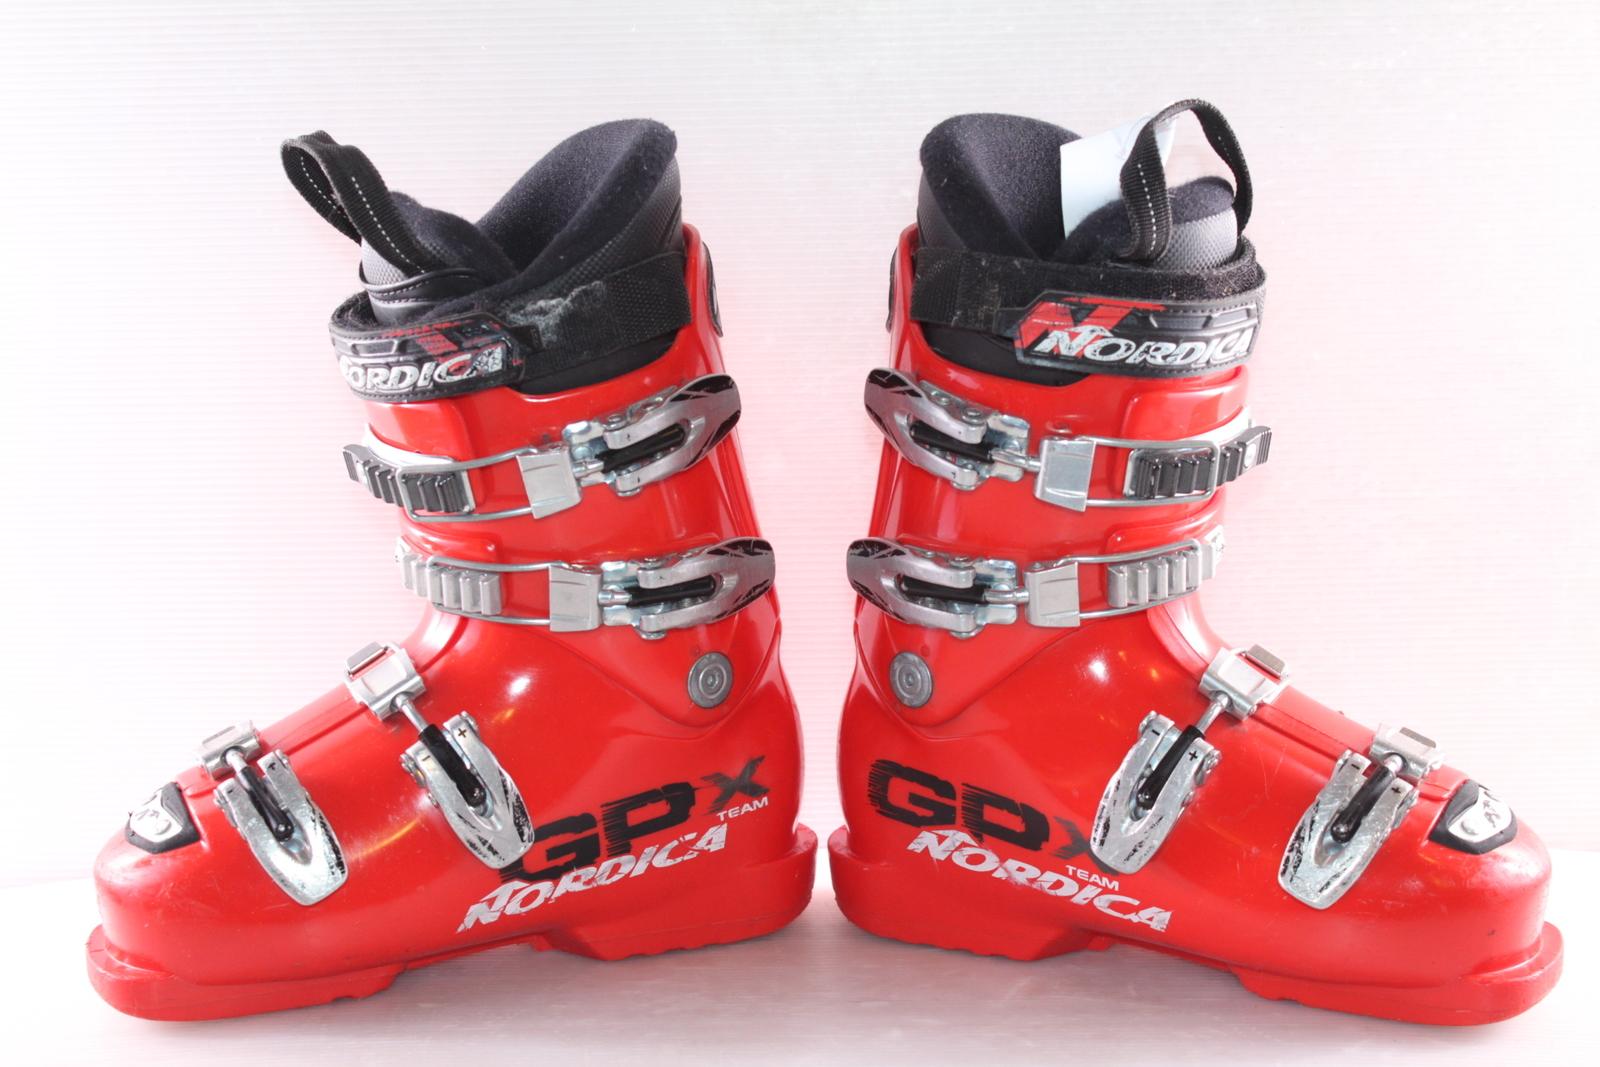 Dětské lyžáky Nordica GPX Team vel. EU36